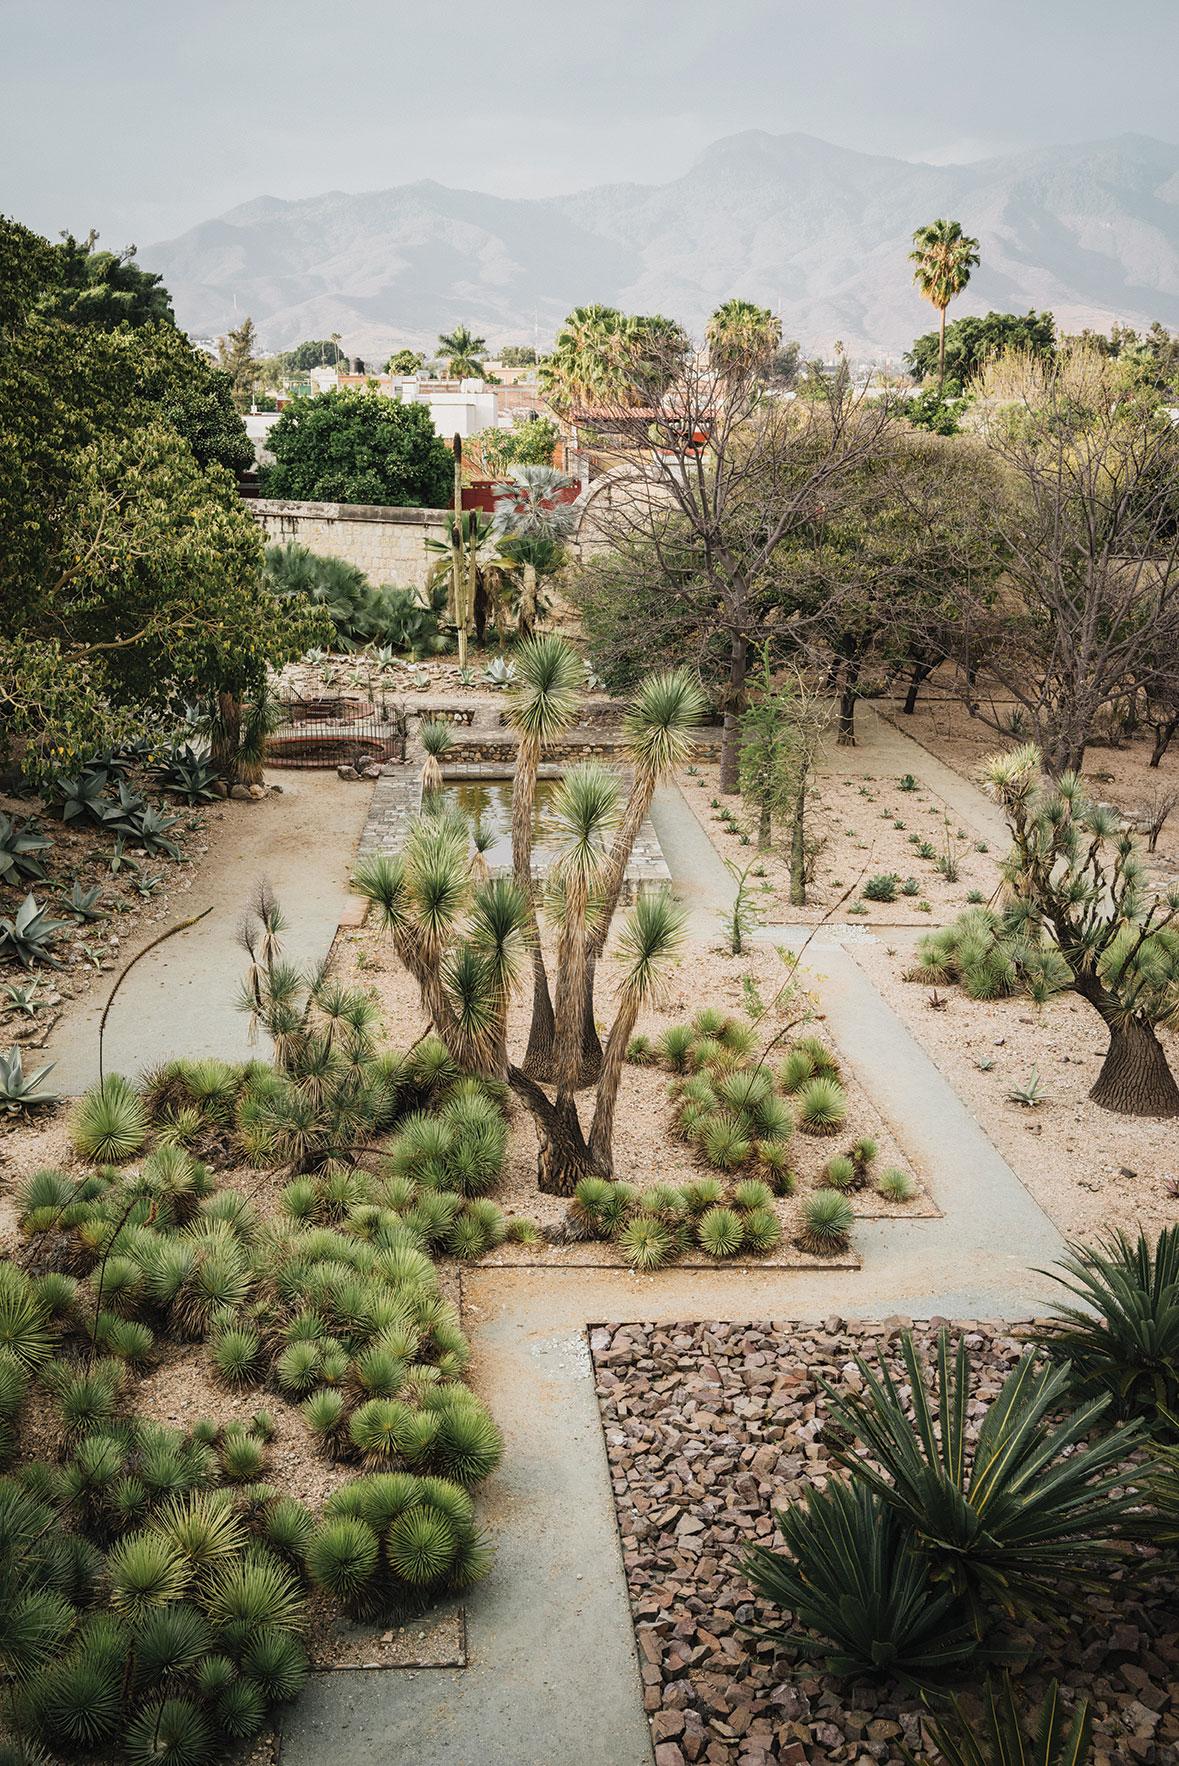 oaxaca travel mexico jardin etnobotanico de oaxaca ethnobotanical garden botanical